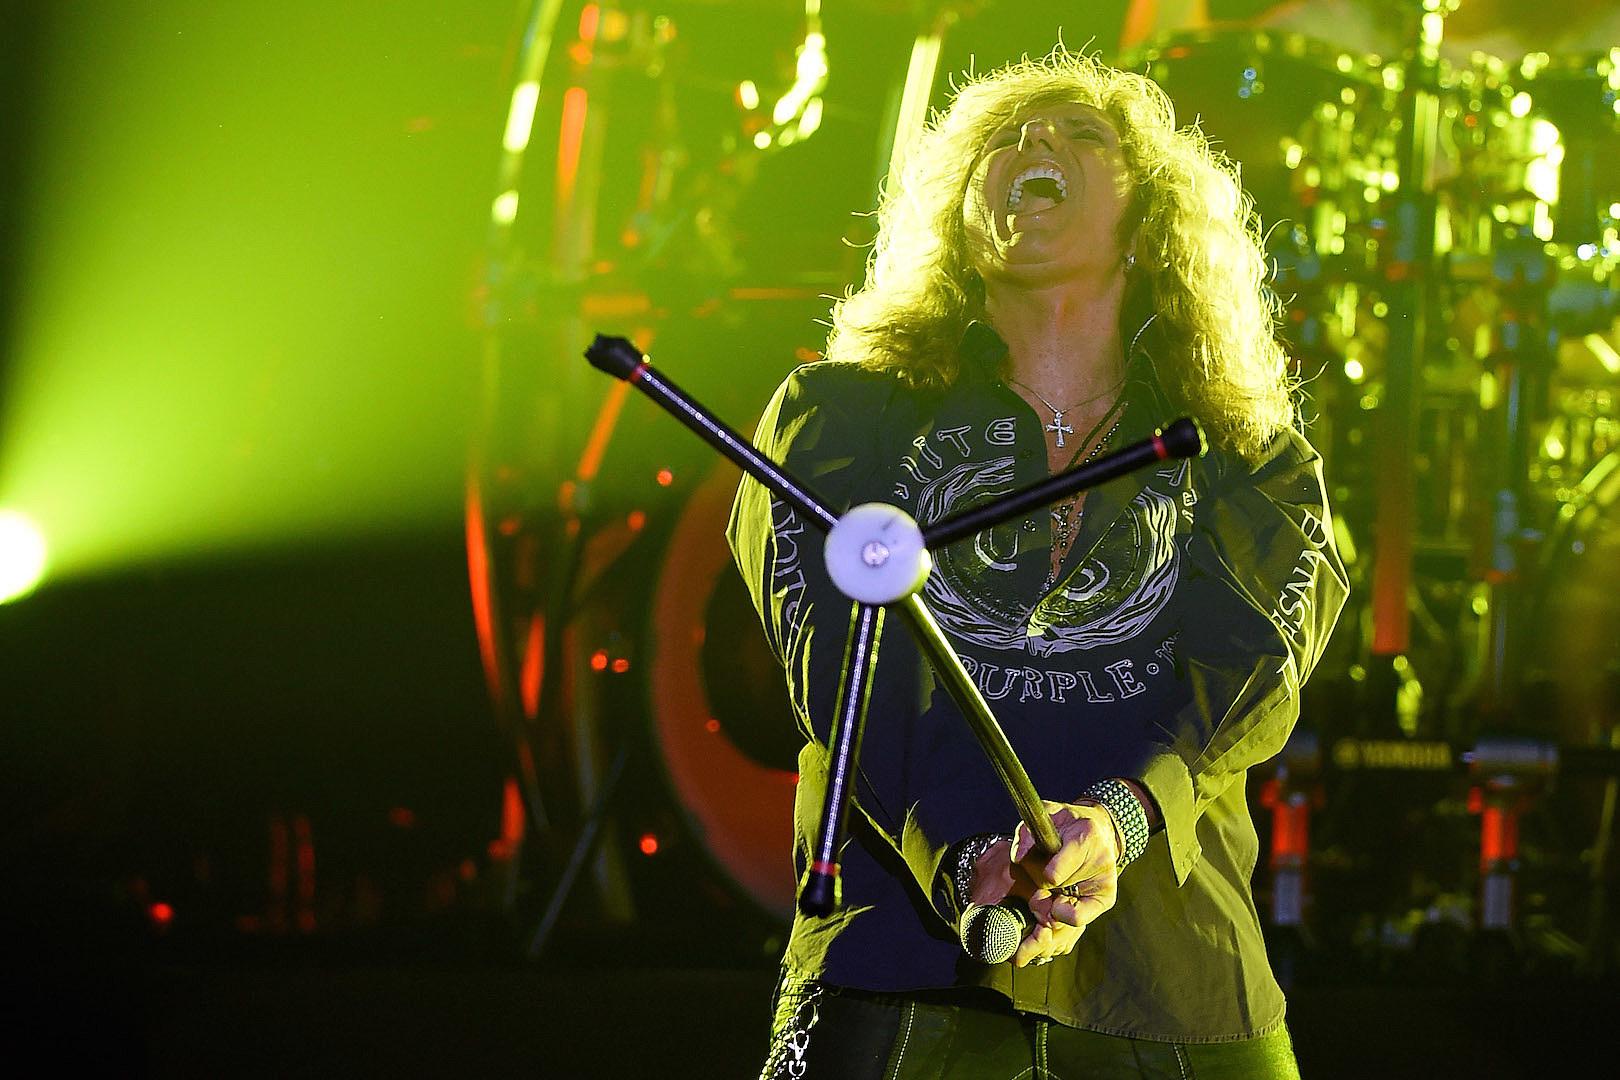 Whitesnake's David Coverdale: Meditation, Love, Ritchie Blackmore